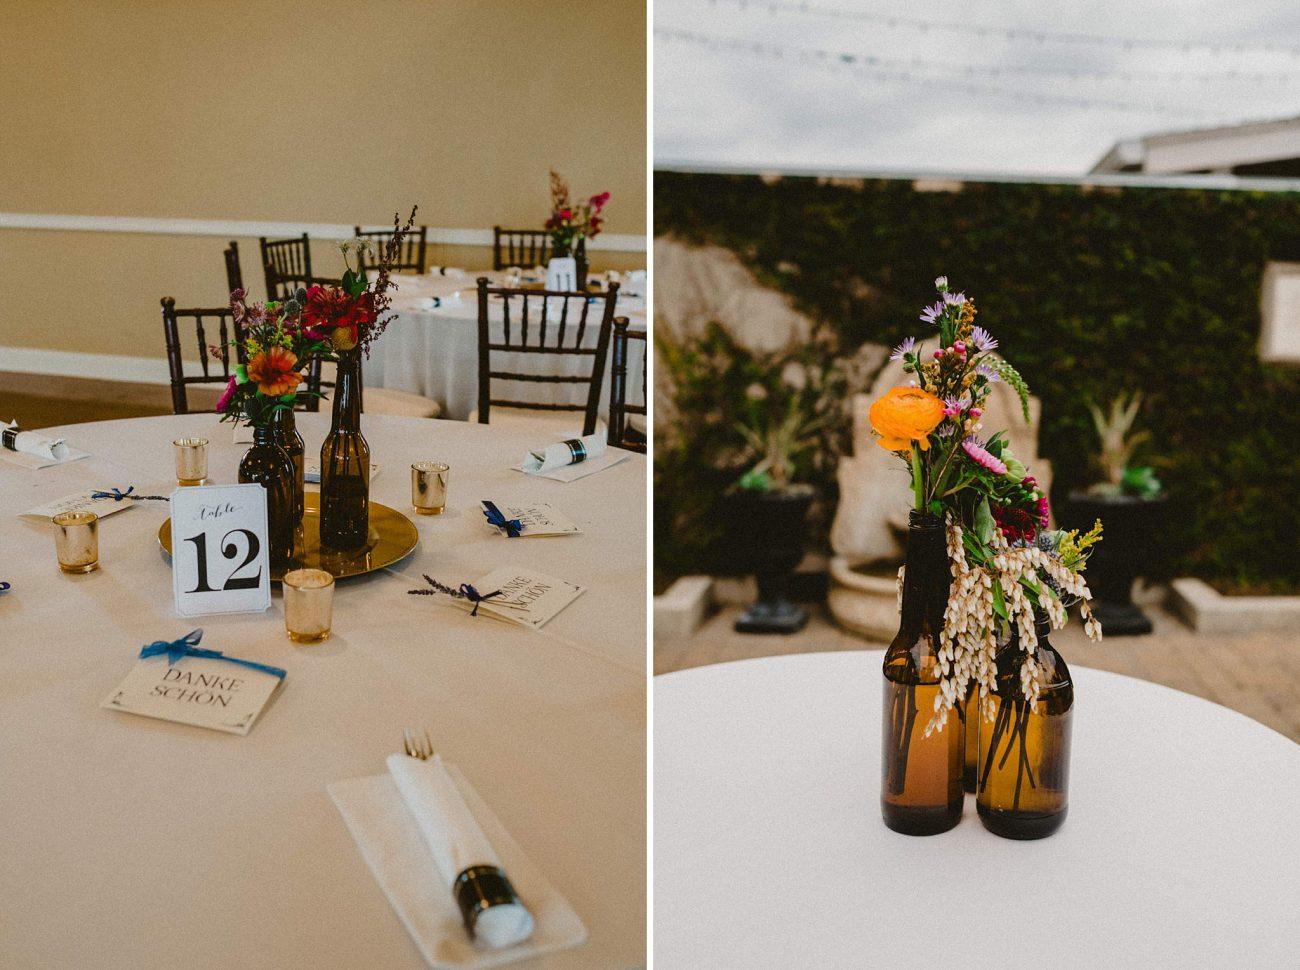 flowers in beer bottles for wedding